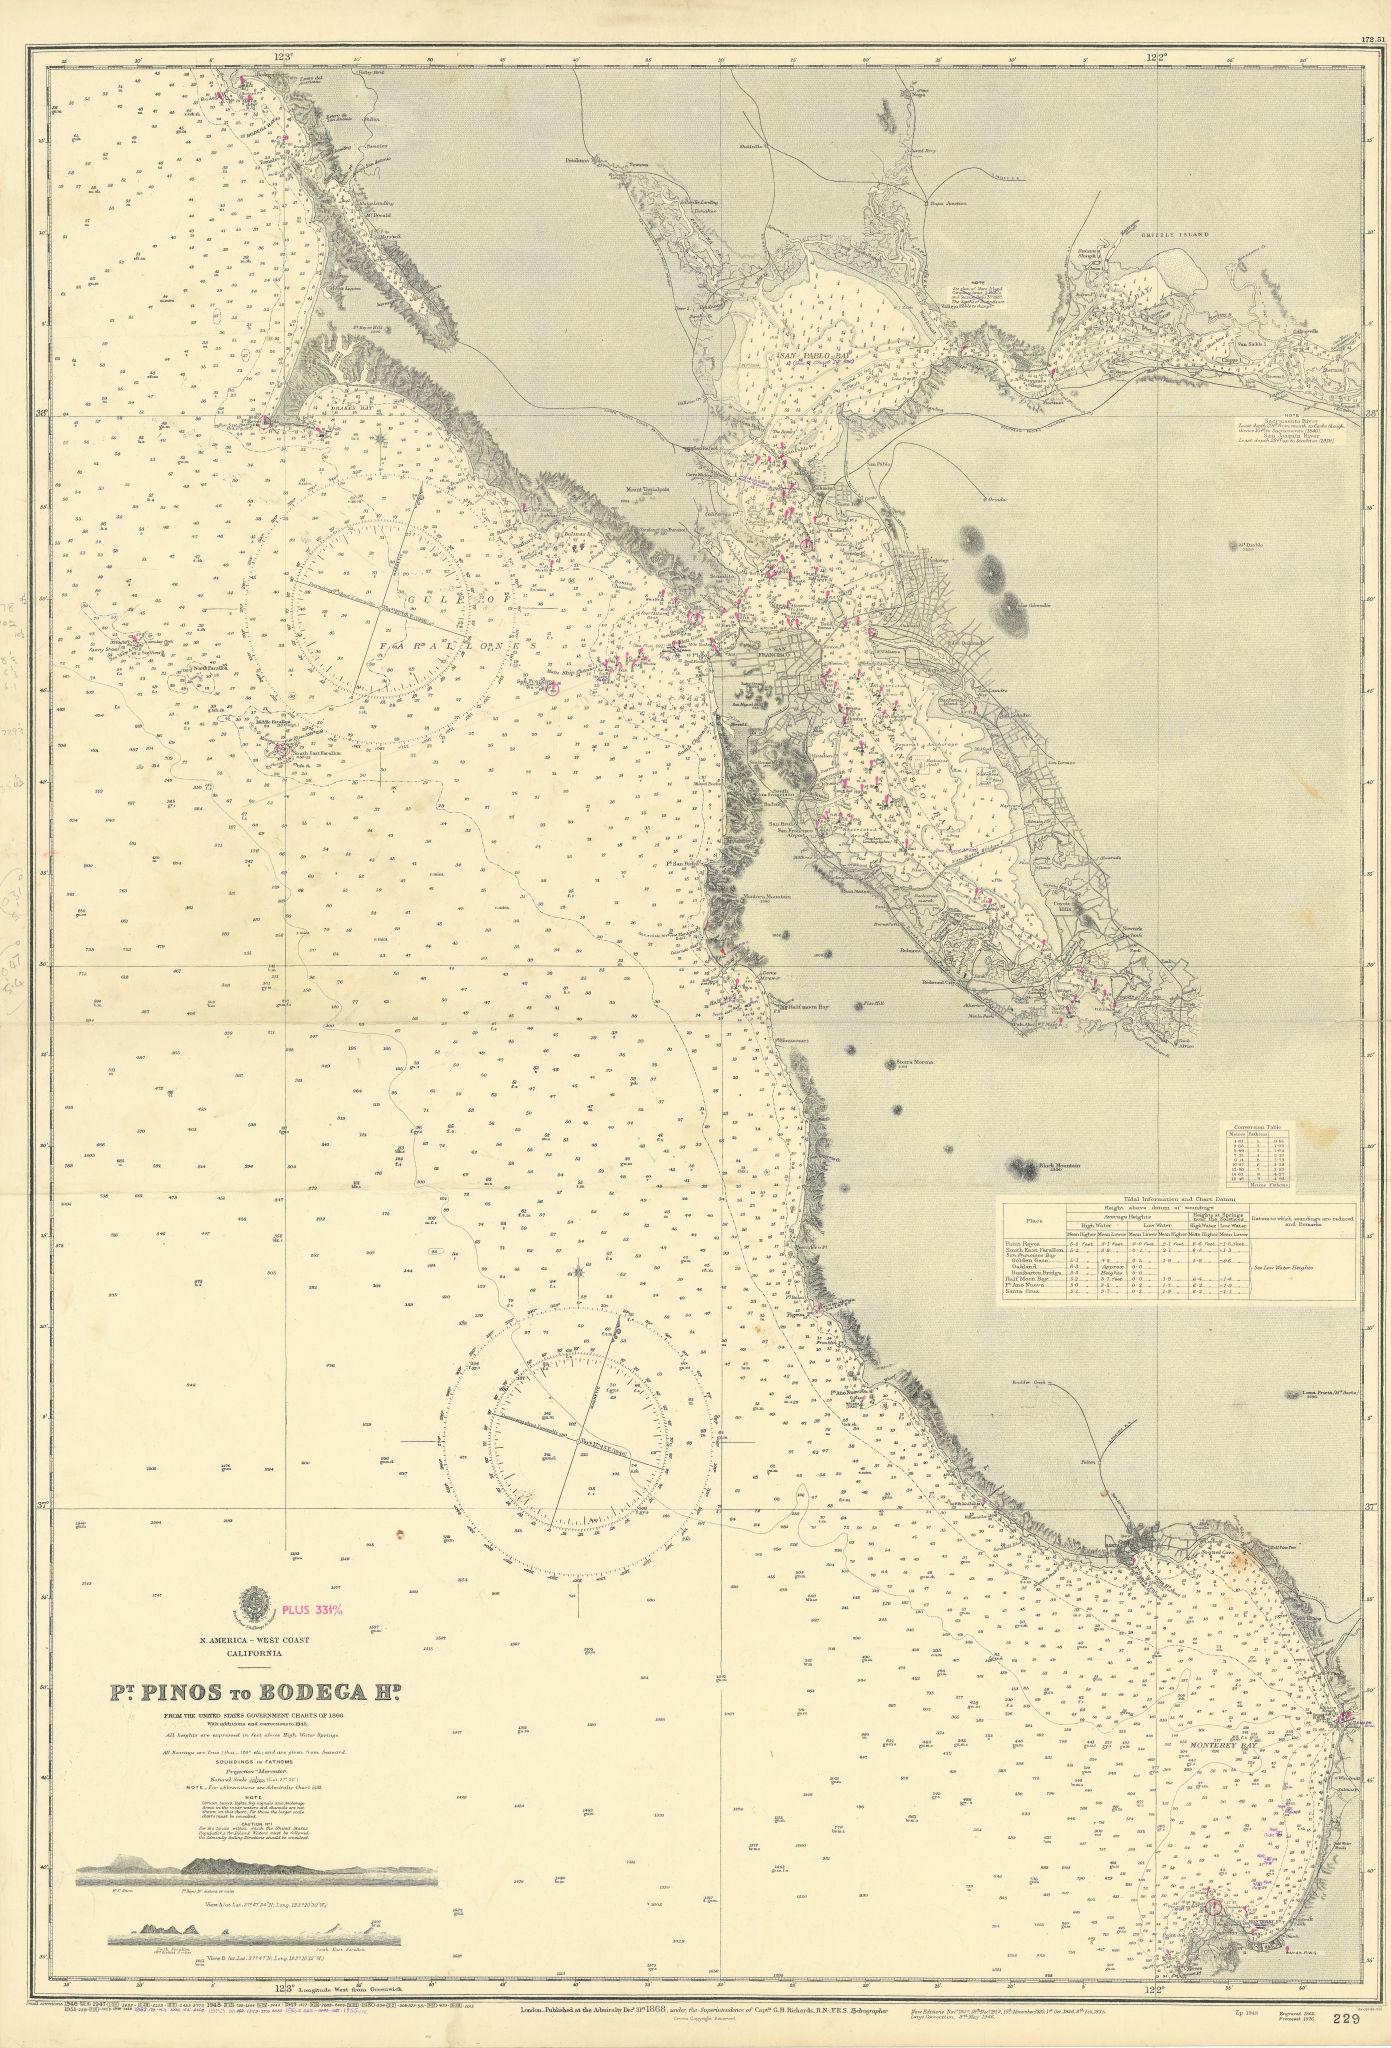 California coast. Monterey San Francisco Bay ADMIRALTY sea chart 1868 (1955) map